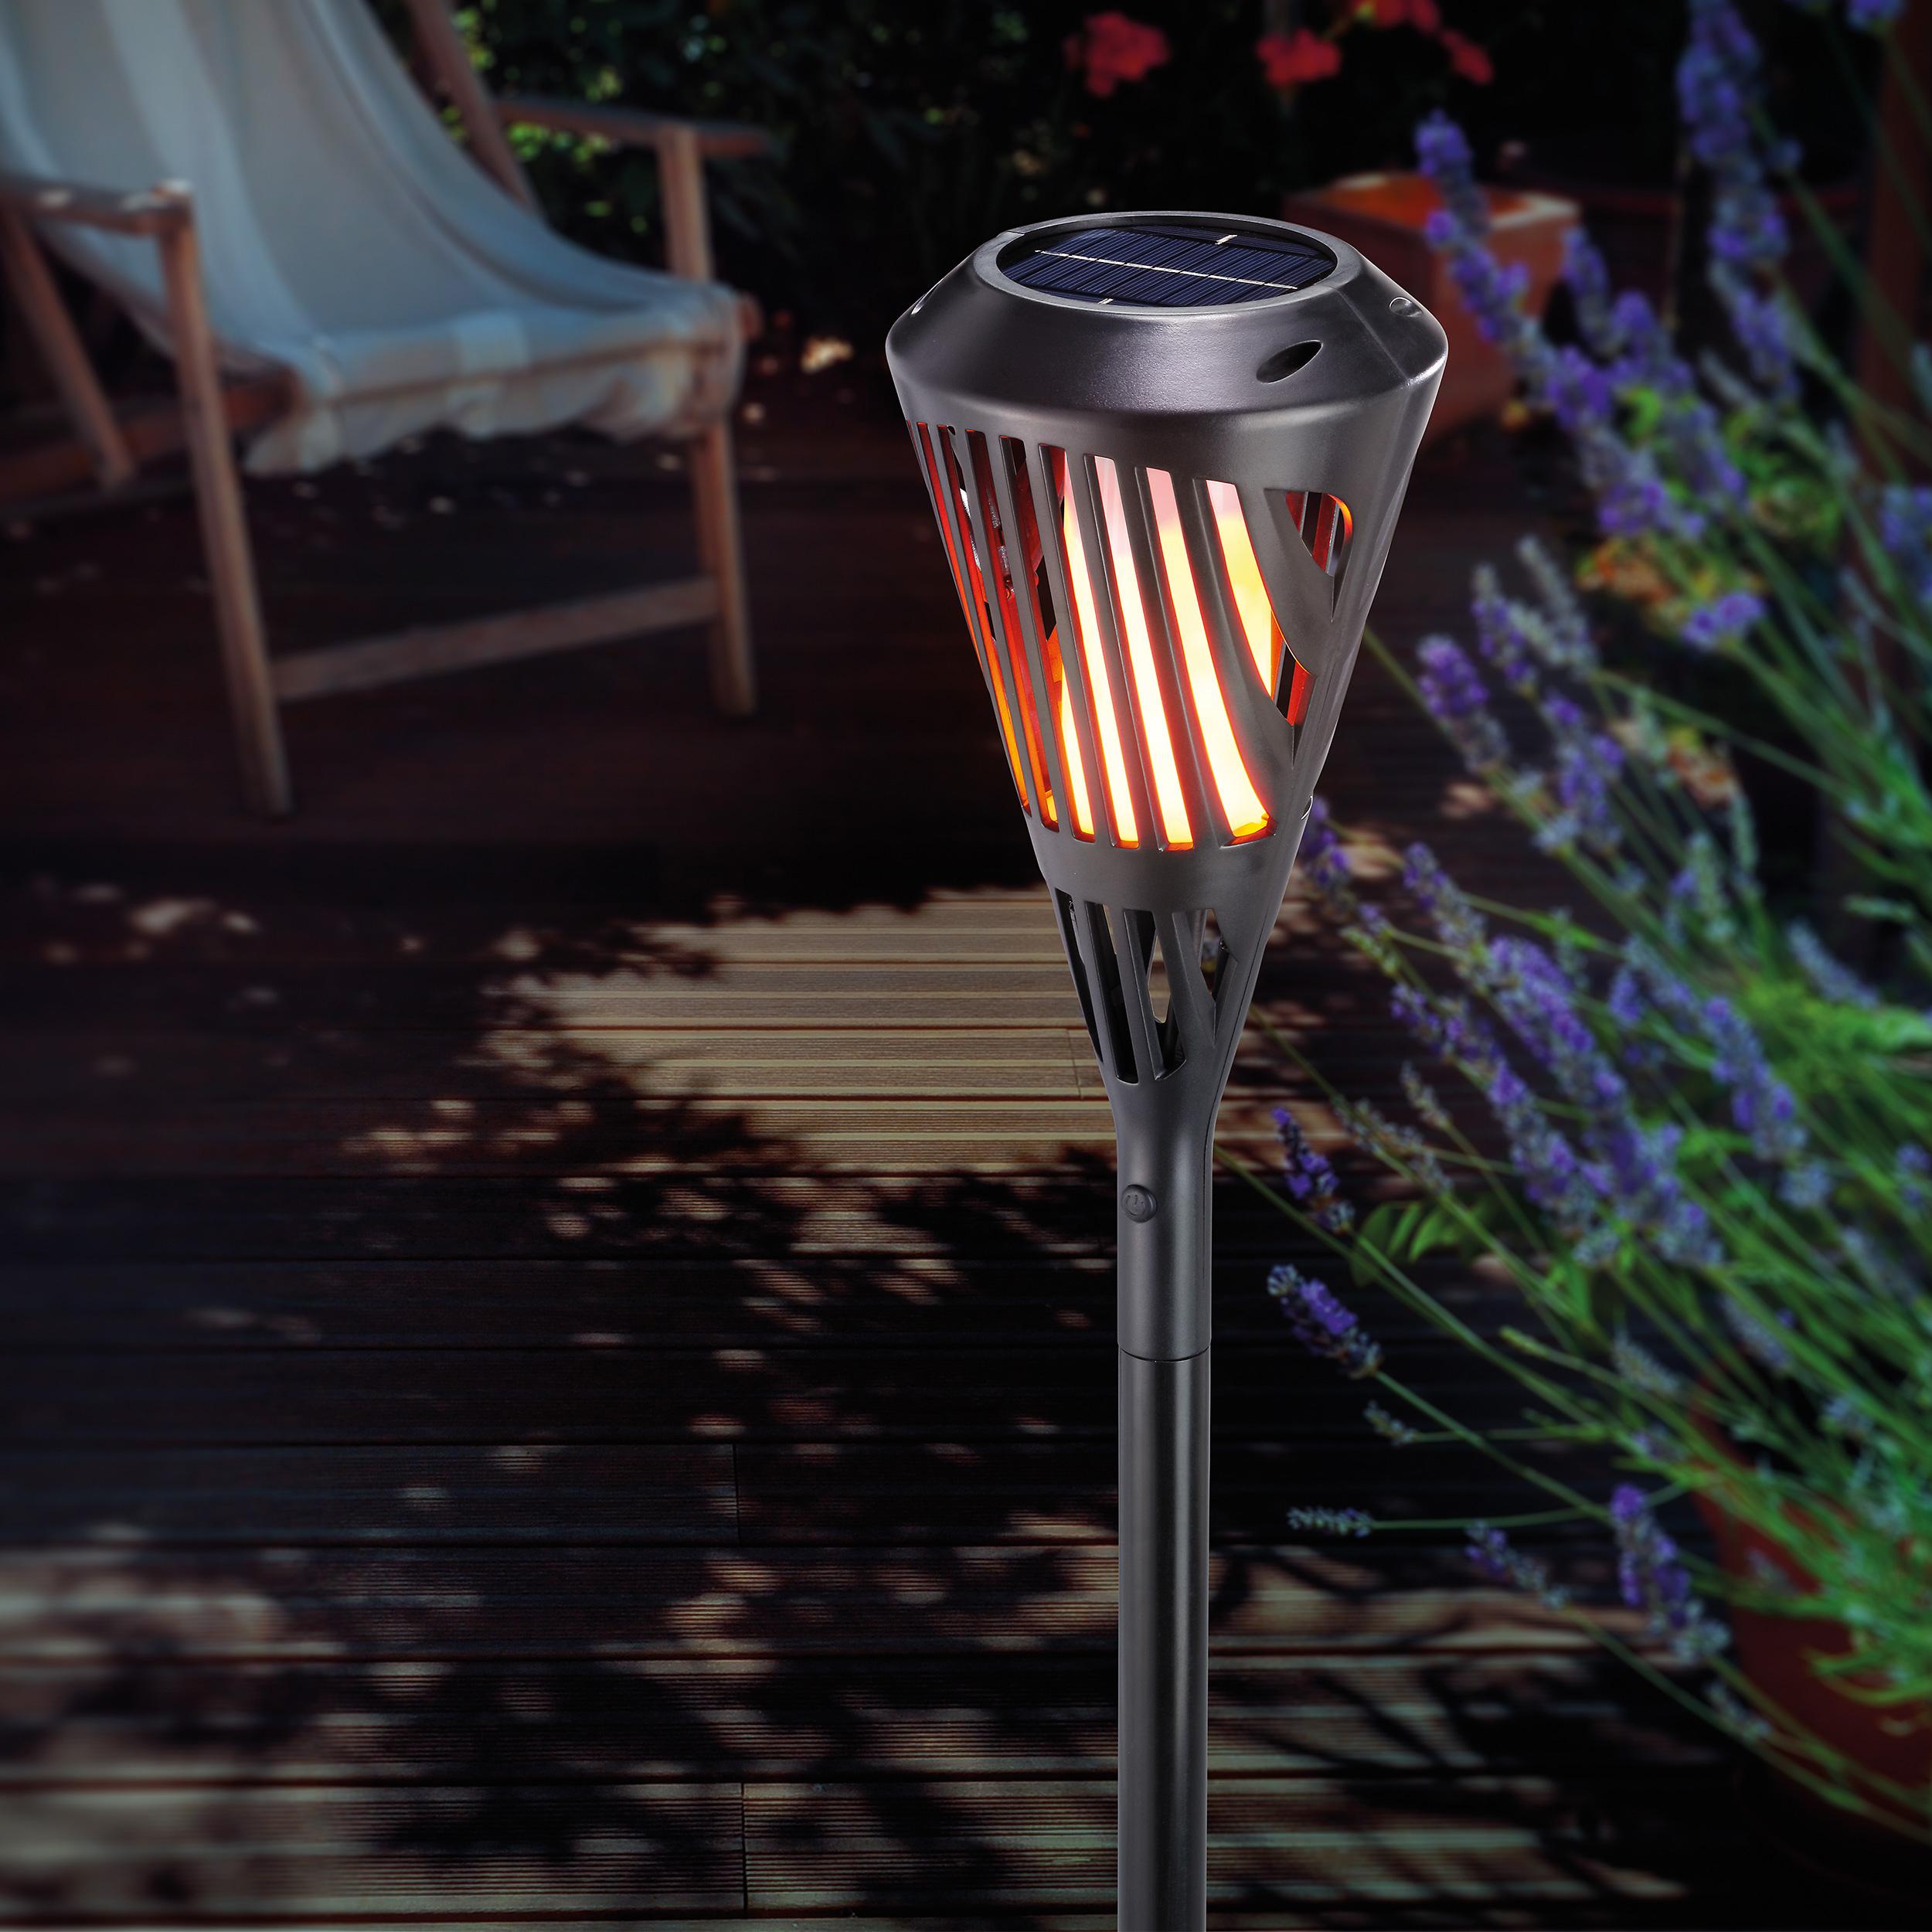 Solar Gartendeko Luxus Led Outdoor Fackel Wasserdicht & solar Gartendeko